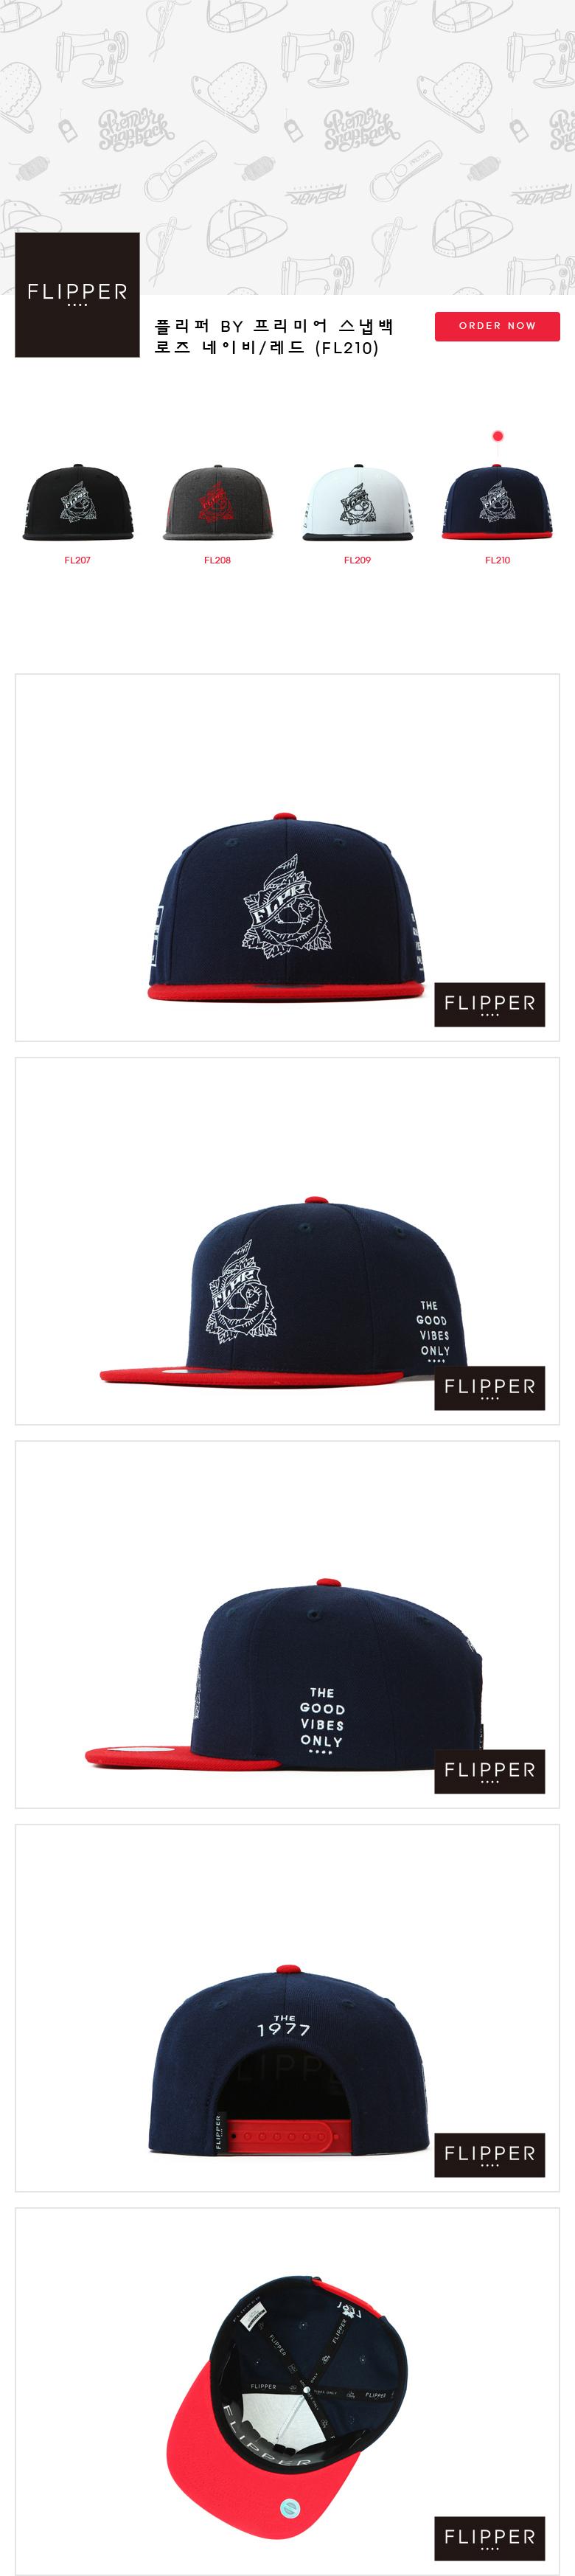 [ PREMIER ] [Premier] Flipper Snapback Rose Navy/Red (FL210)